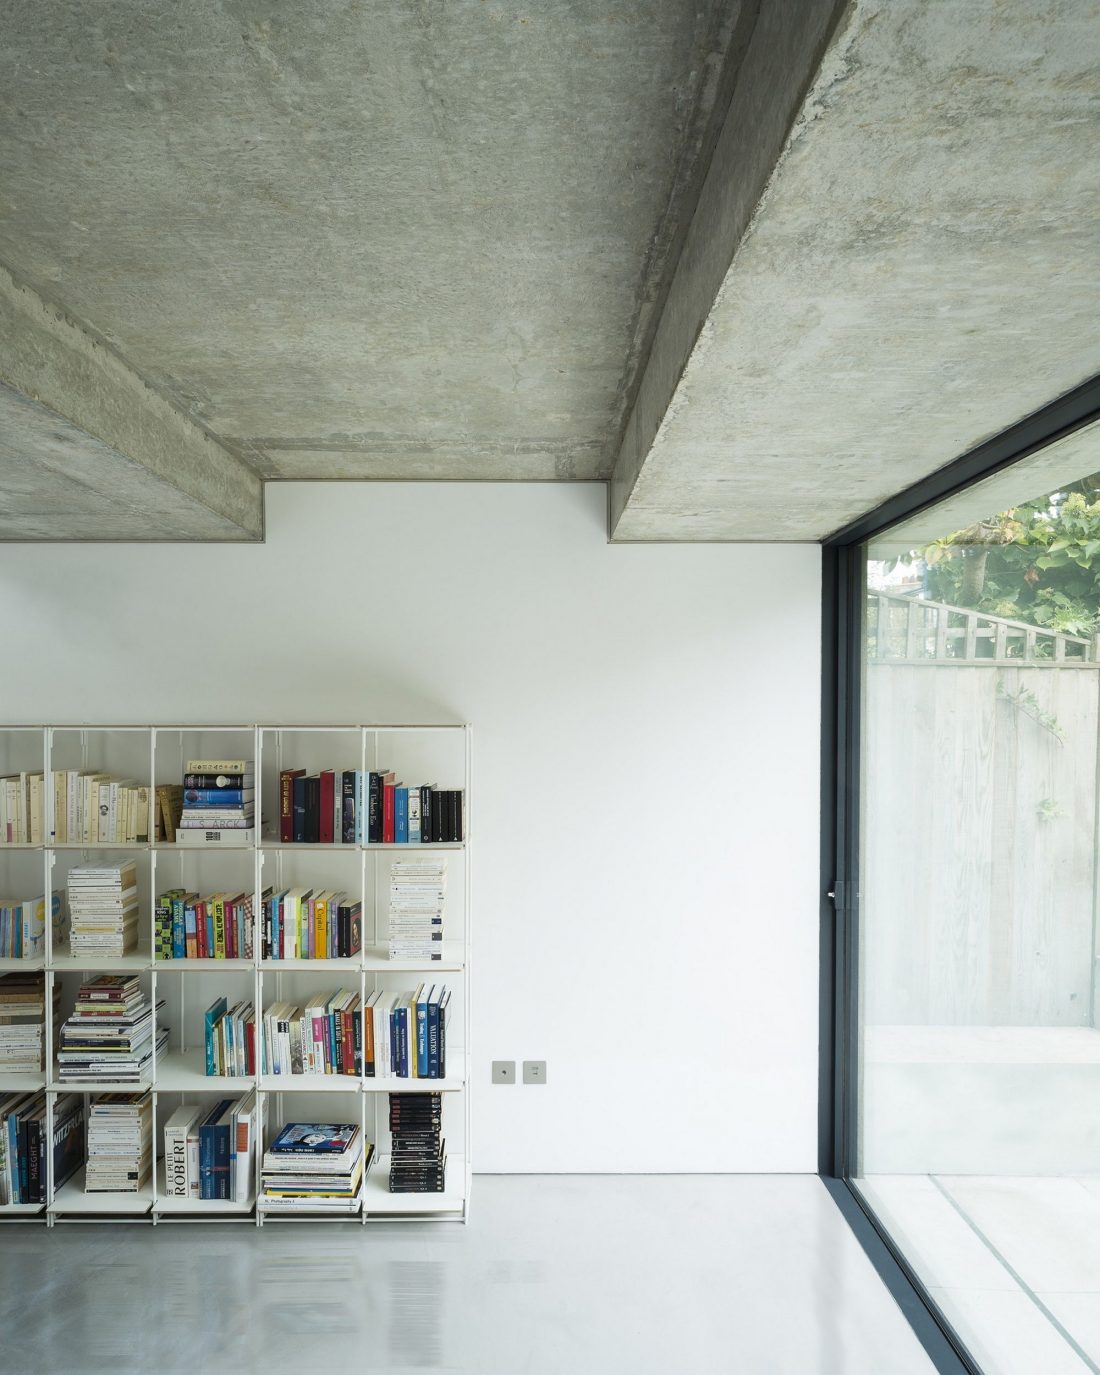 dinamika-i-obem-v-predelah-50-metrov-proekt-bureau-de-change-architects-7